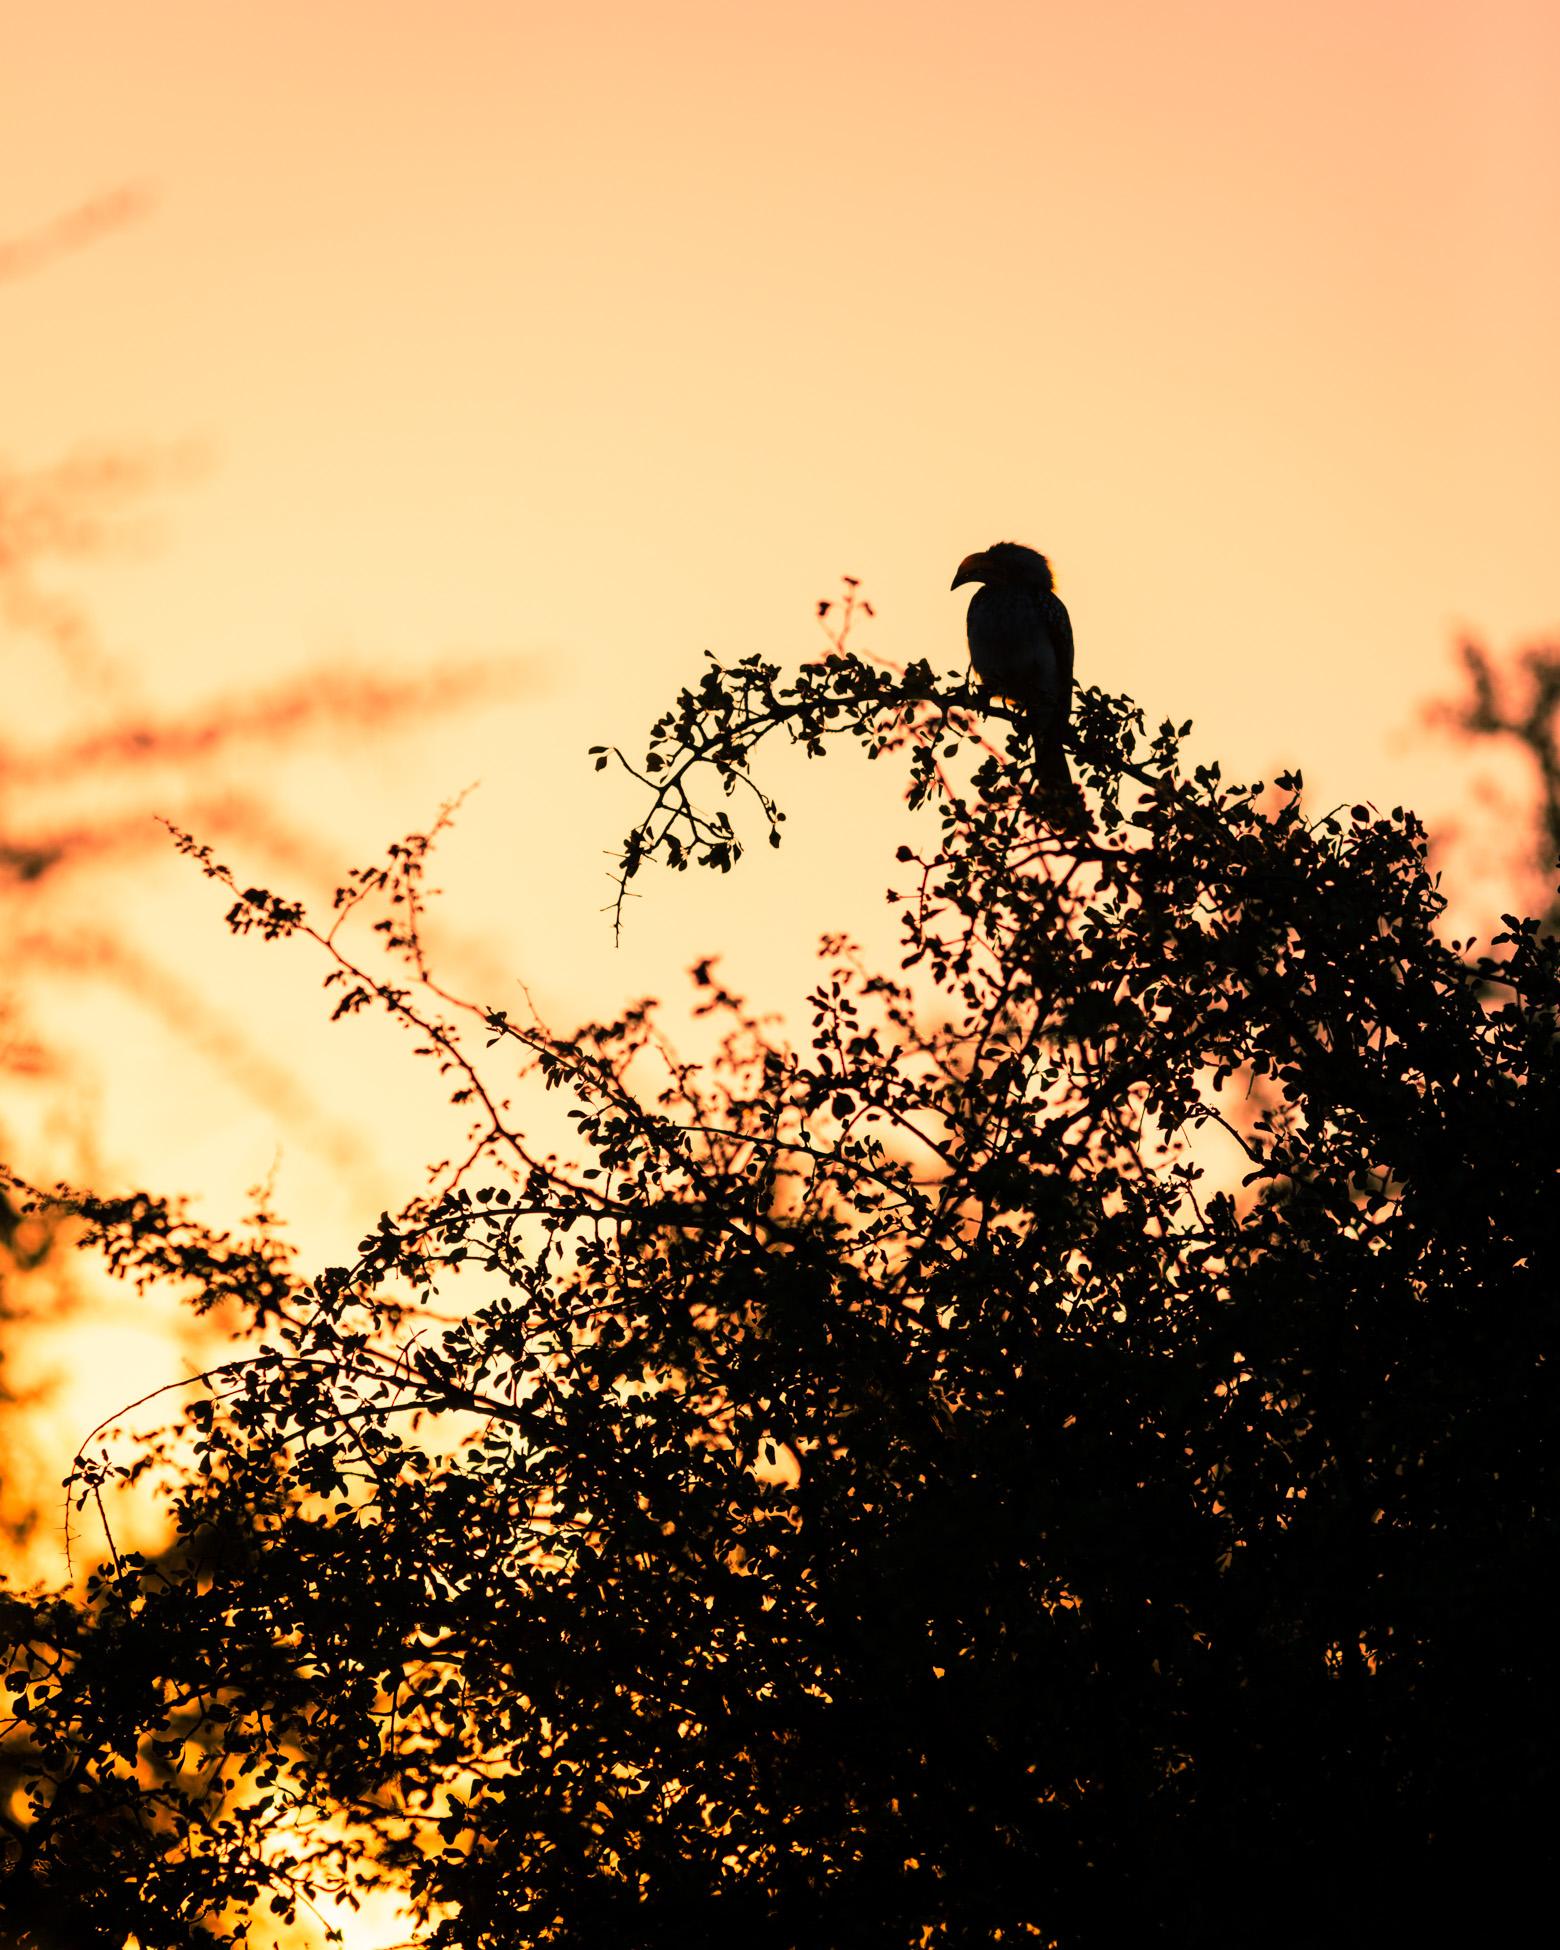 wildlife-photography-workshop-greengraf-photography.jpg